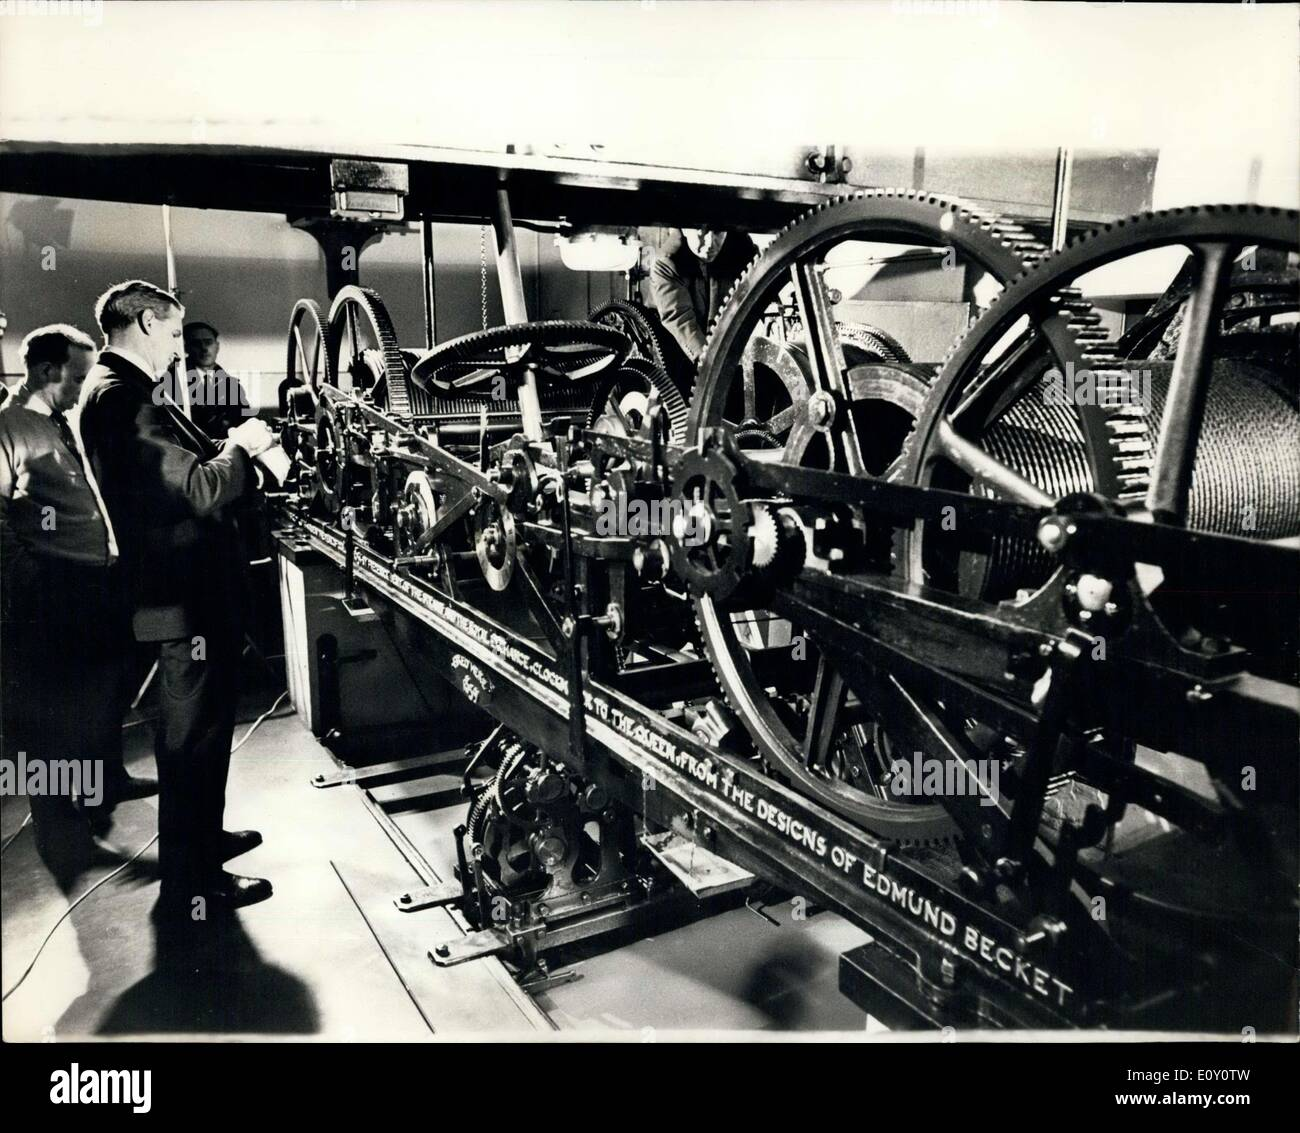 Feb. 18, 1968 - Inside Big Ben: Mr. Daniel Buckney checking his watch last night before stopping Big Ben in order Stock Photo